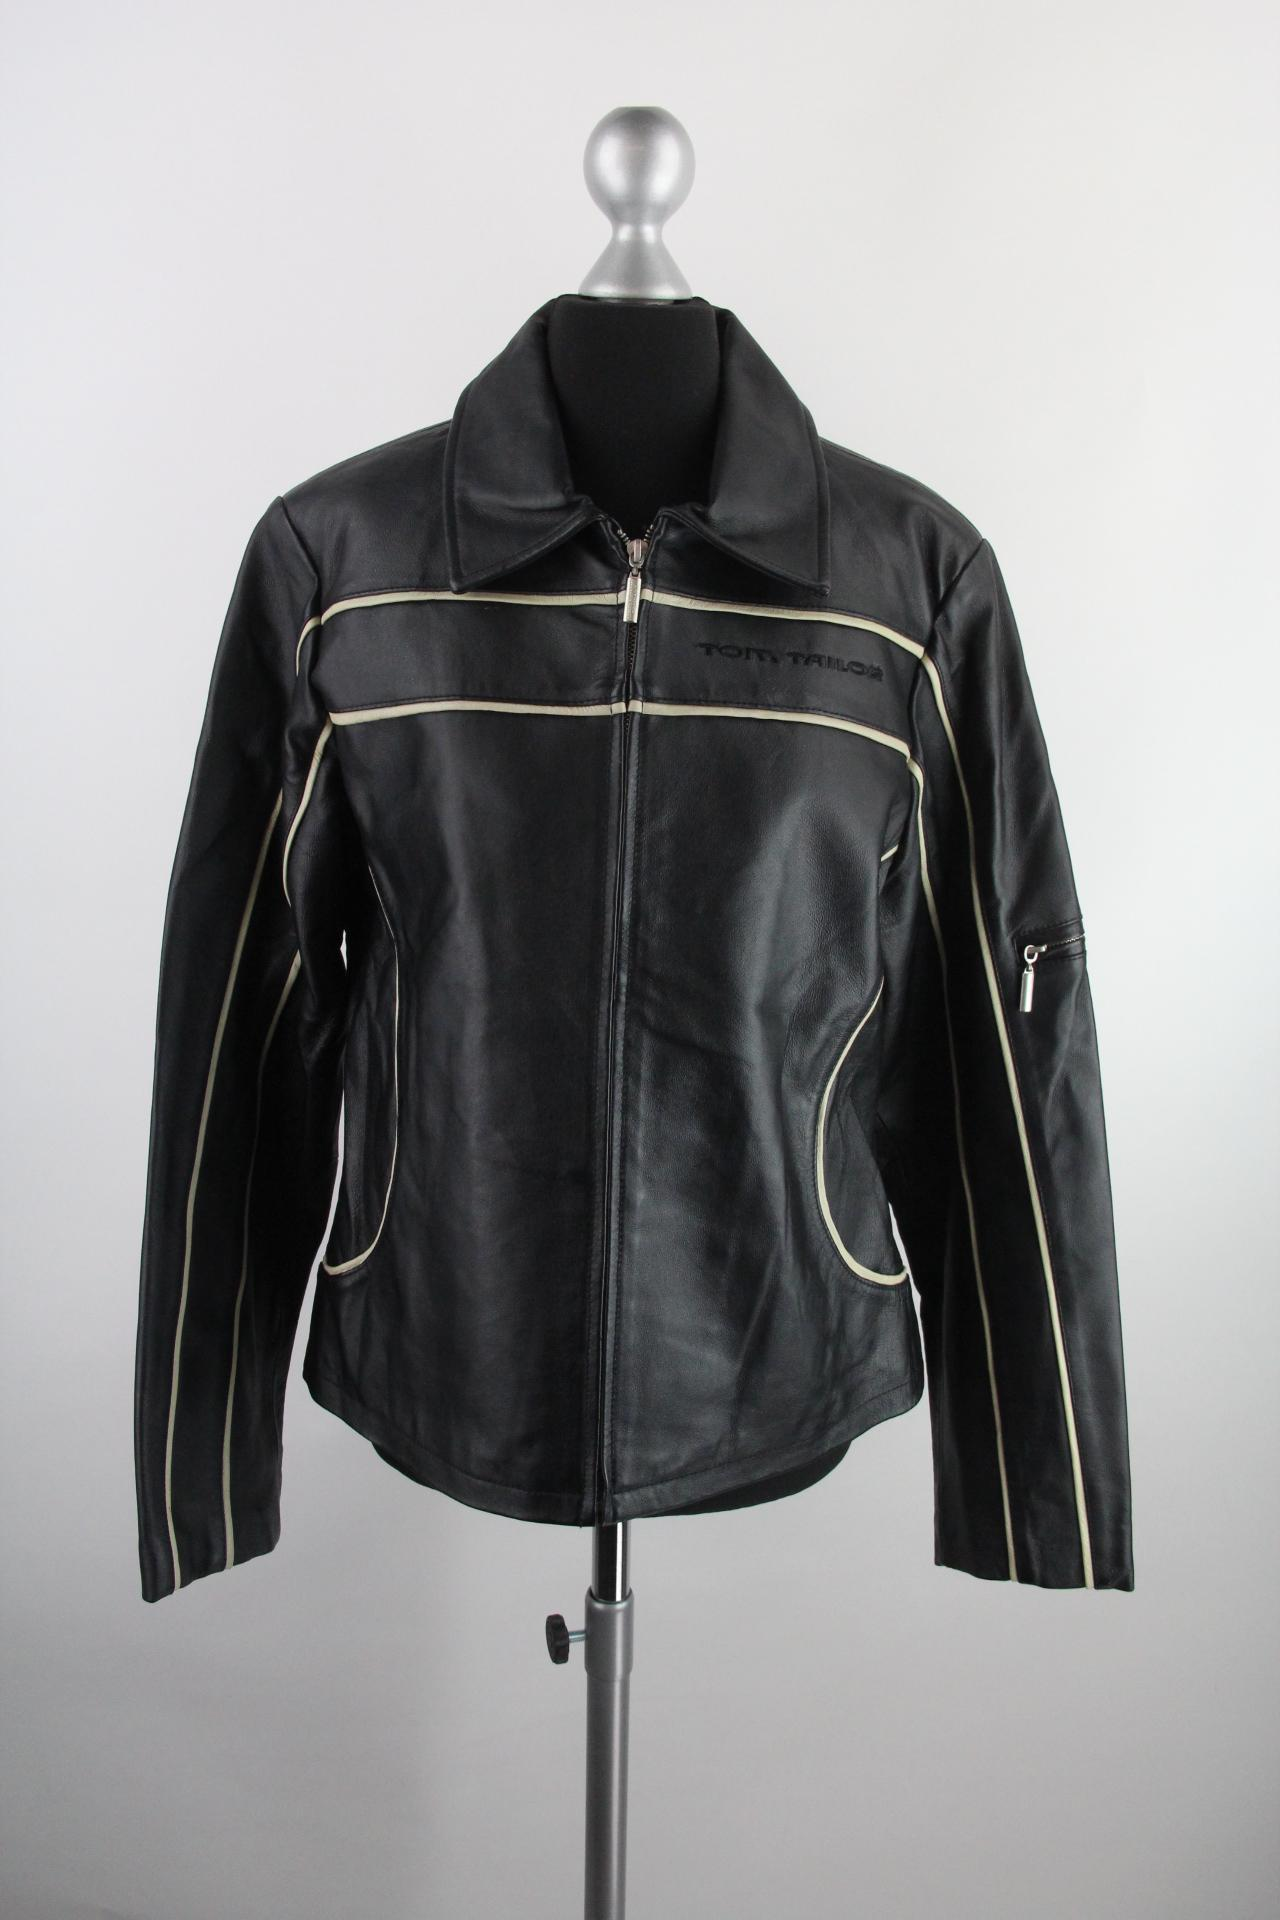 Tom Tailor schwarze Herren-Lederjacke mit Reißverschluss Gr.L Top ... 0a43d76897